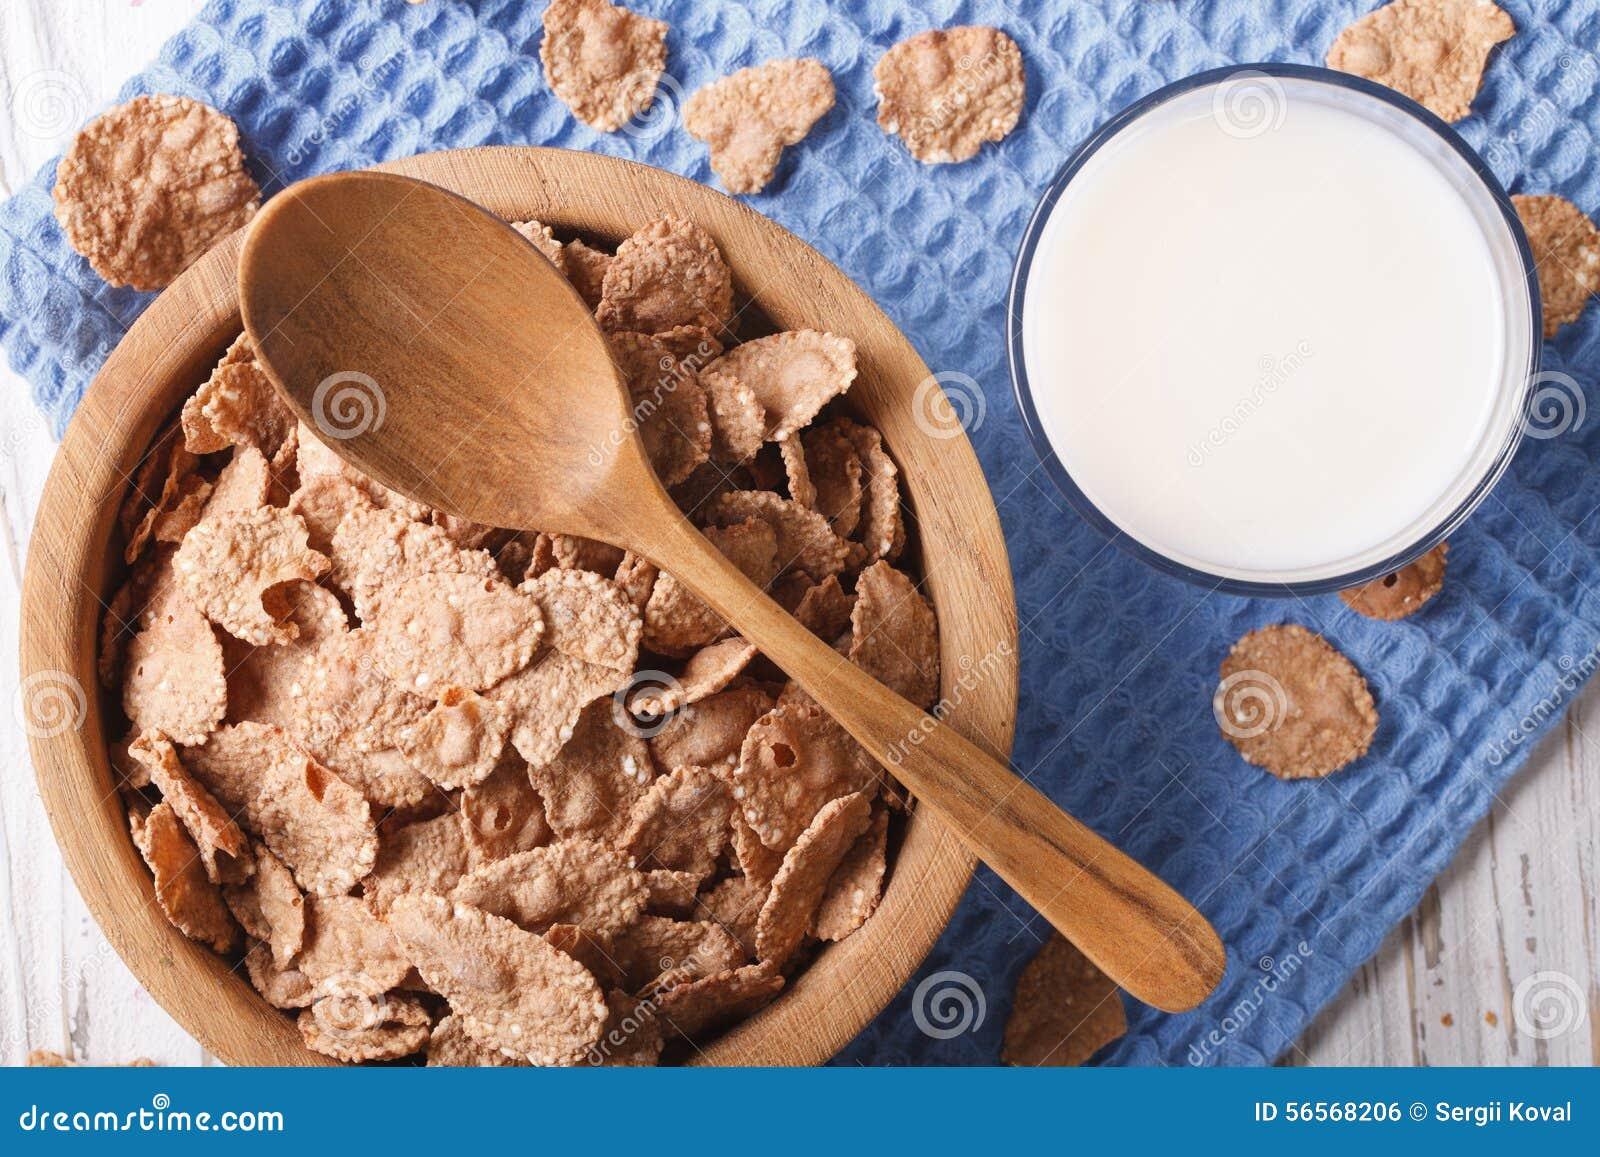 Download Νιφάδες δημητριακών σε μια ξύλινη κινηματογράφηση σε πρώτο πλάνο κύπελλων και γάλακτος Τοπ άποψη Horiz Στοκ Εικόνες - εικόνα από γαστρονομικός, πρωί: 56568206